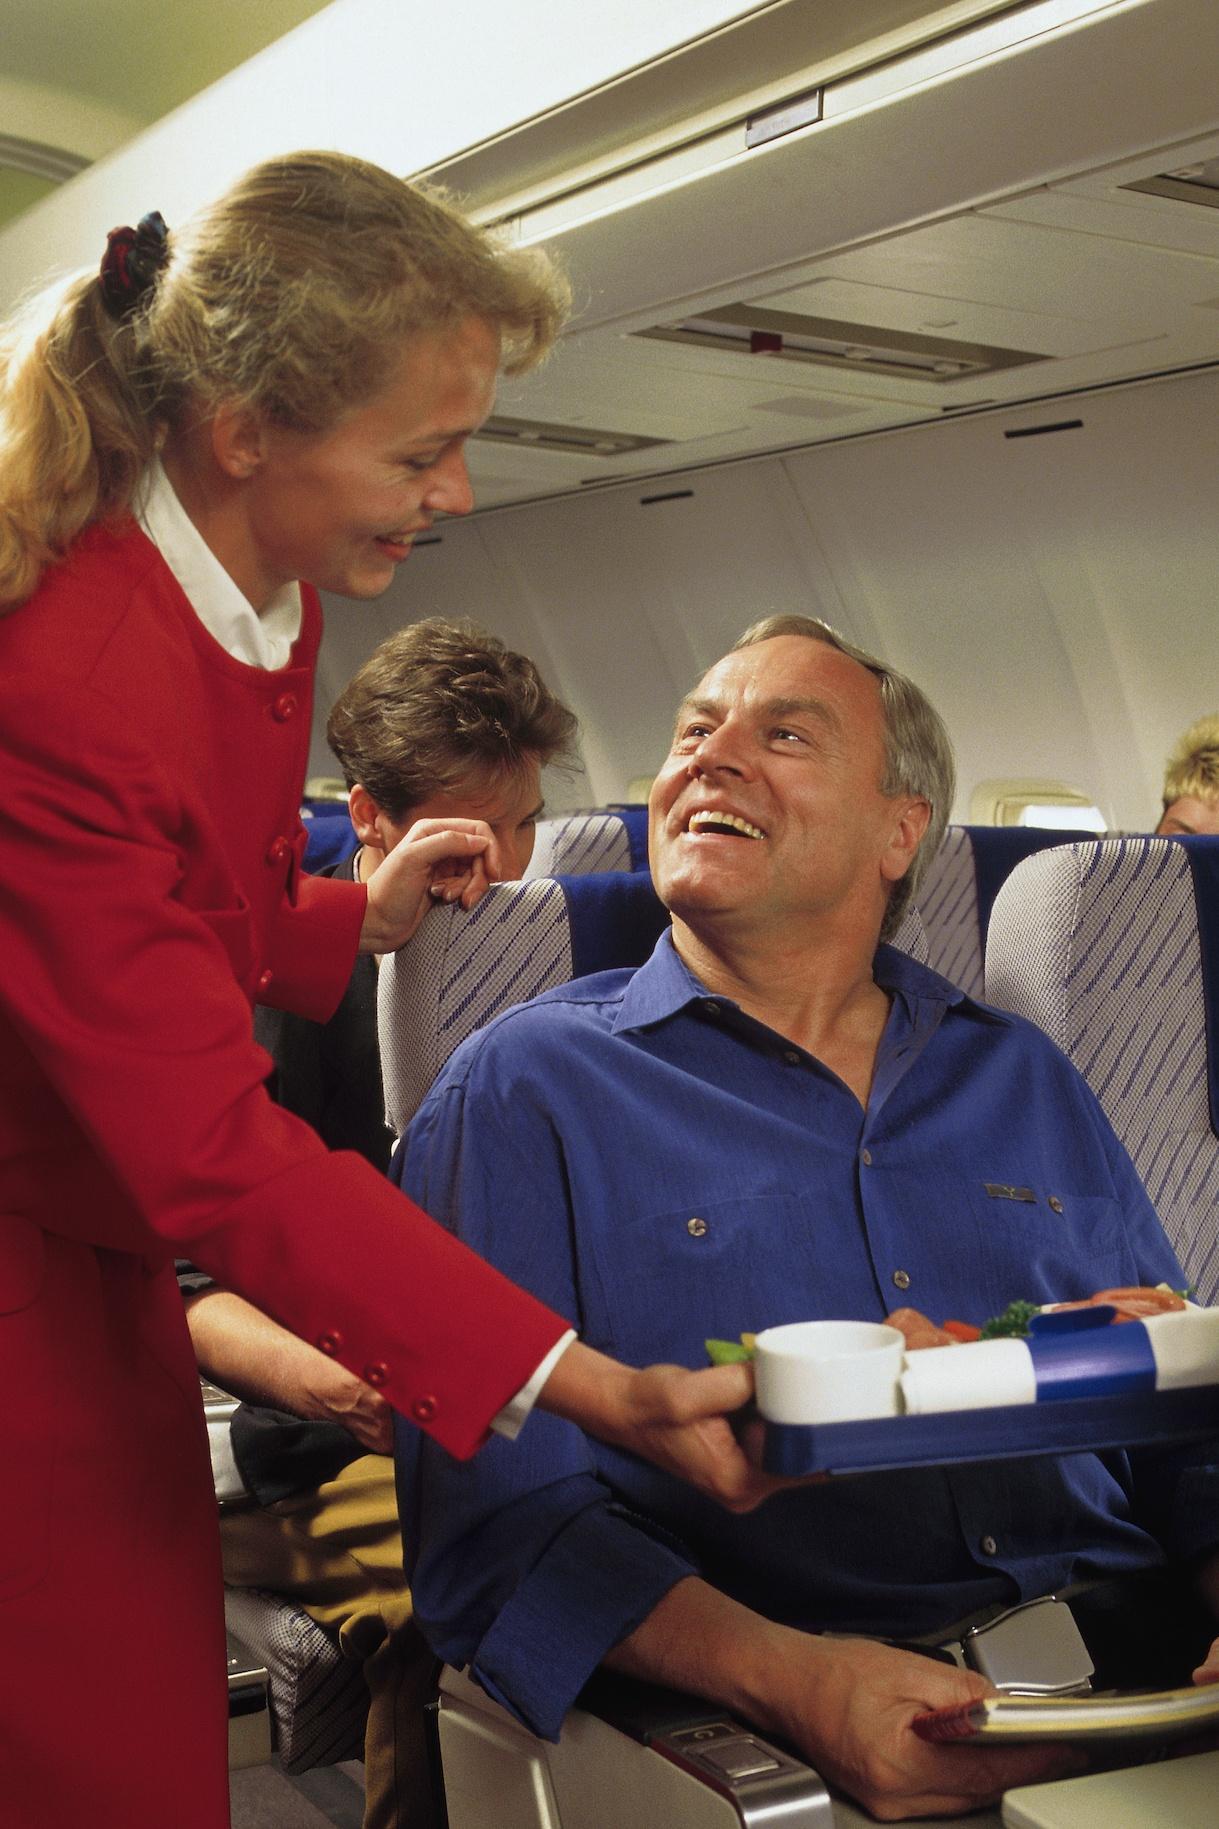 Flight attendant serving passenger on airplane